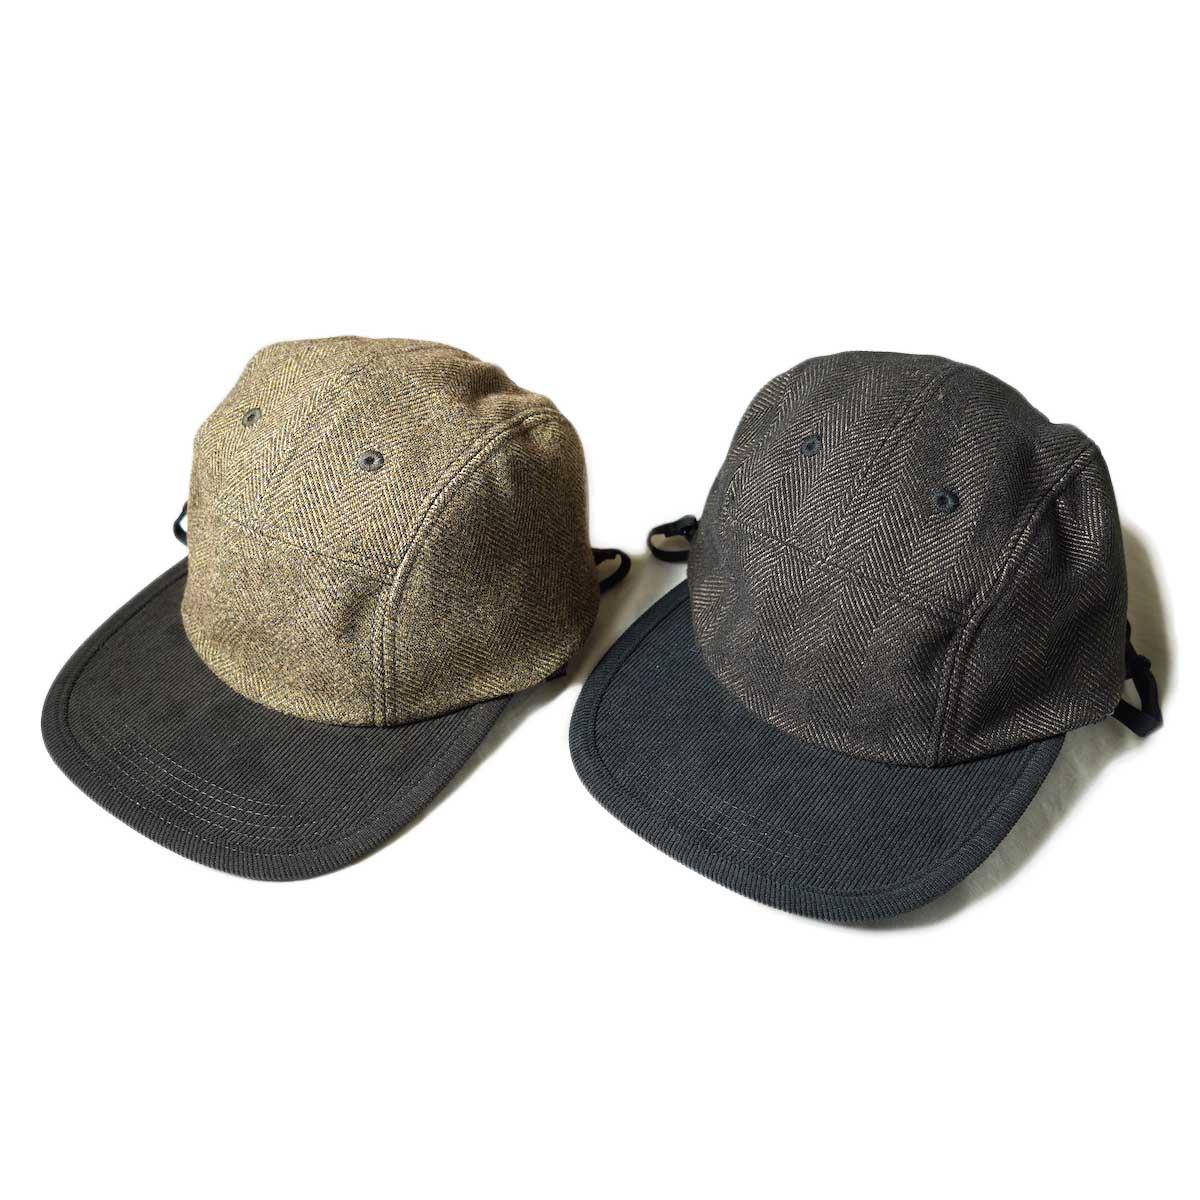 DAIWA PIER39 / TECH TWEED ANGLER'S CAP